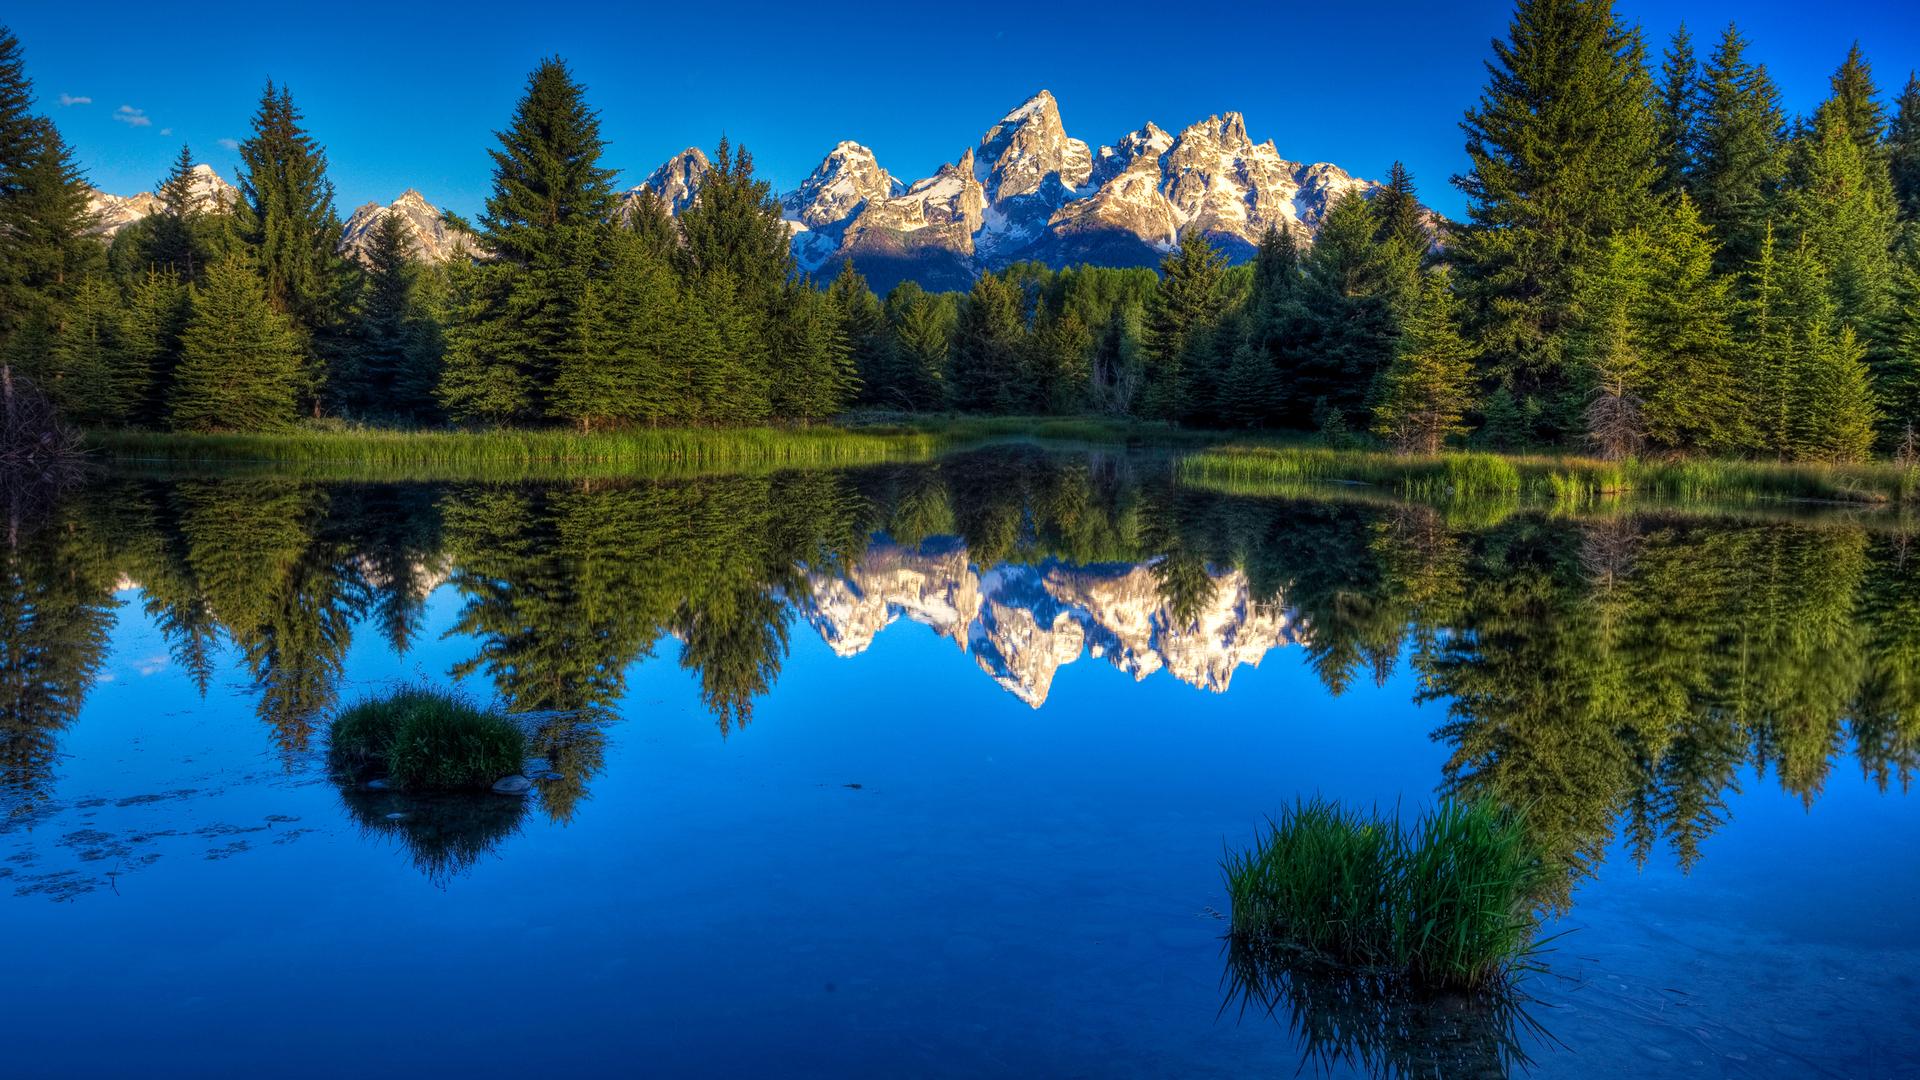 Reflection full hd wallpaper and background image for Sfondi desktop gratis primavera